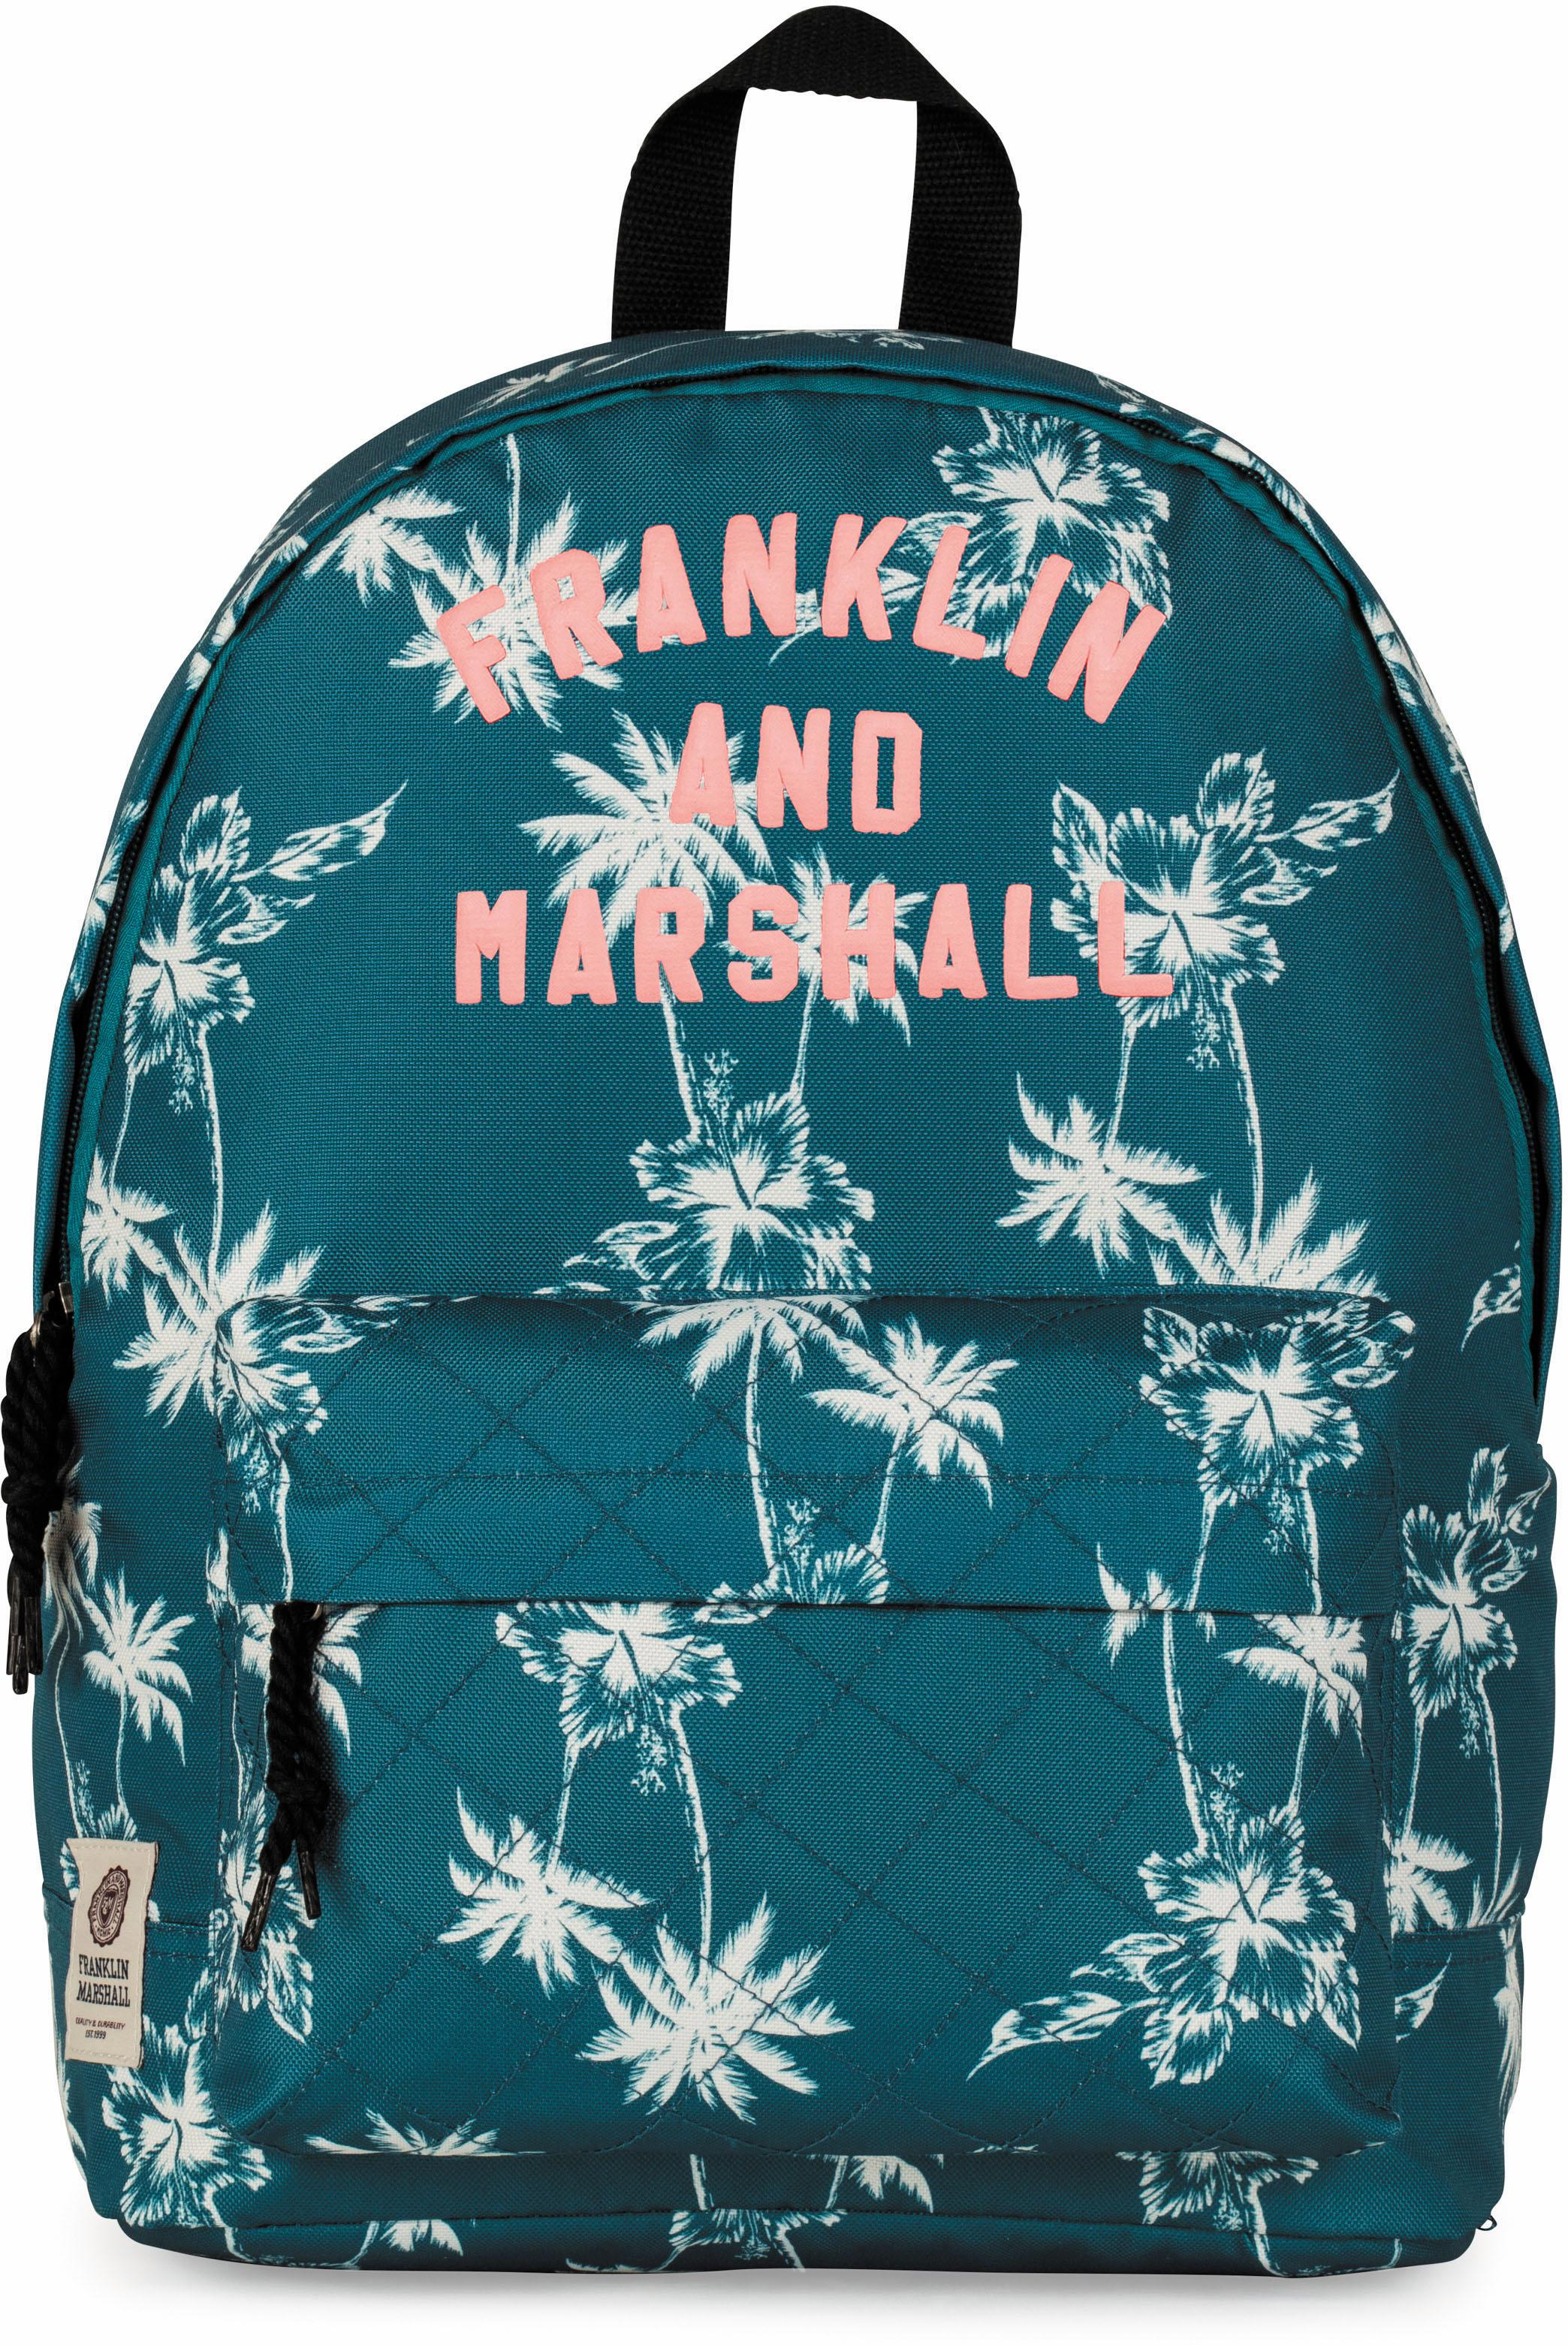 Franklin & Marshall Rucksack Girls Palmen petrol Preisvergleich